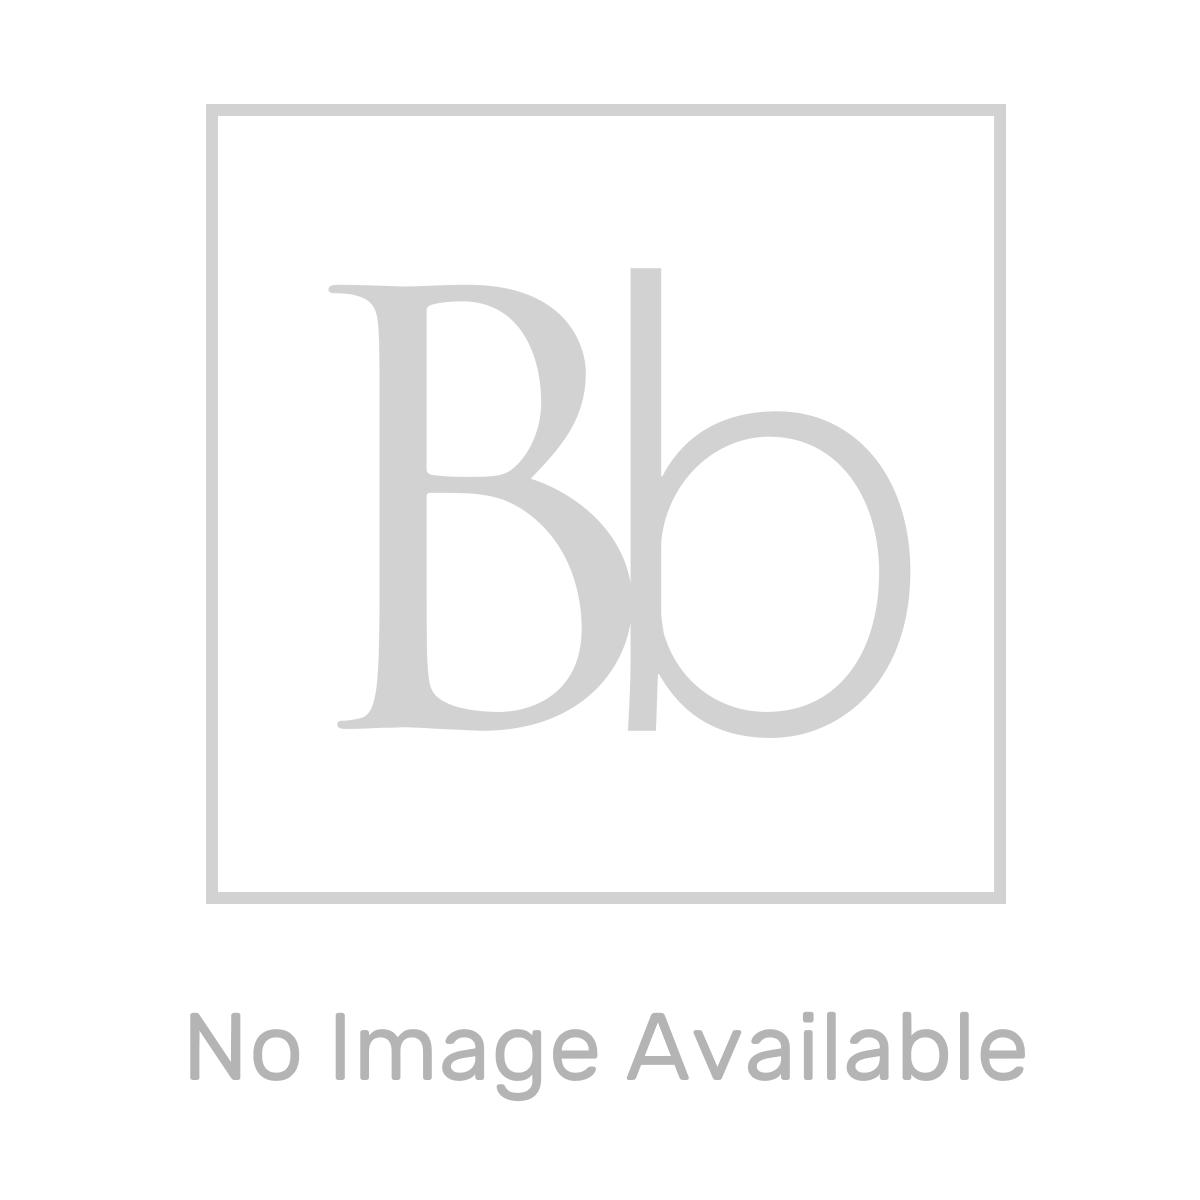 Croydex 1500mm Reinforced PVC Shower Hose Chrome